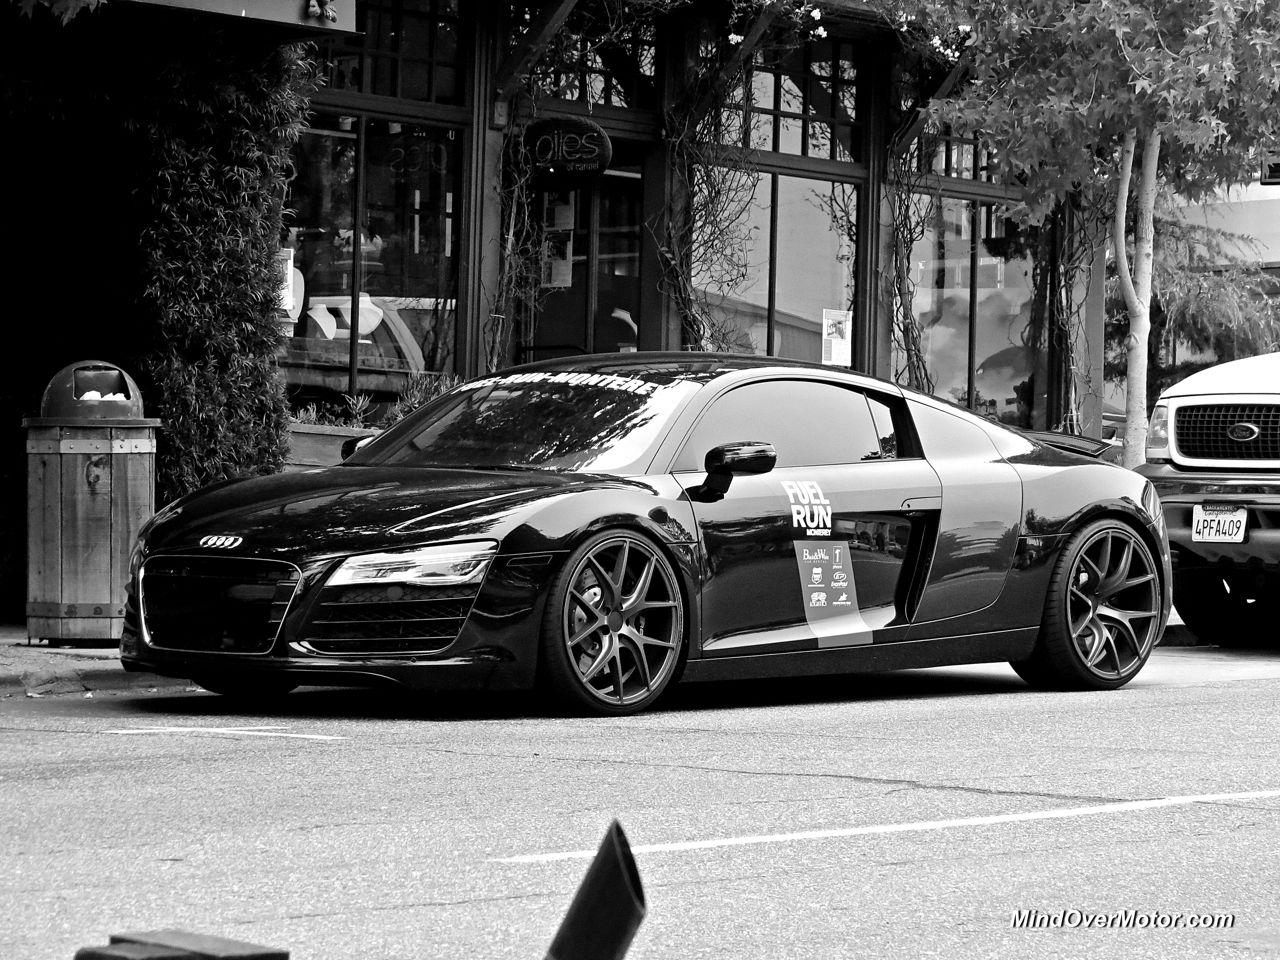 Black Audi R8 Carmel